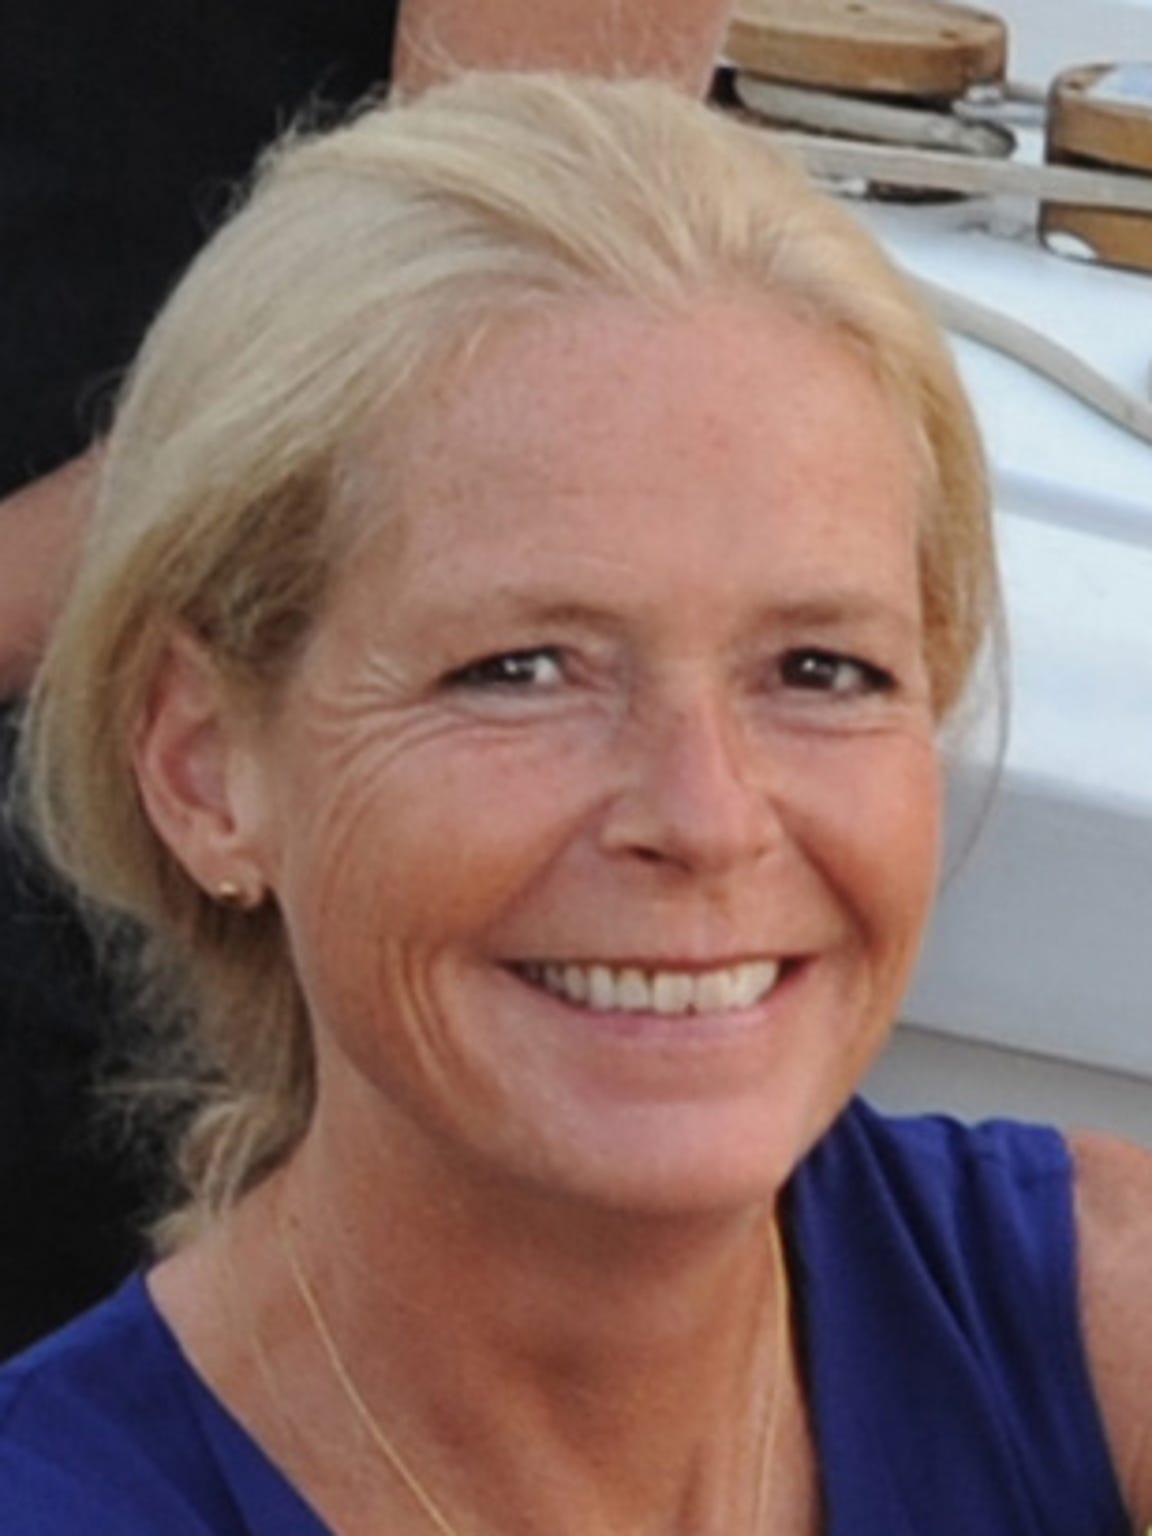 Capt. Katarina Ennerfelt led the first-ever all female